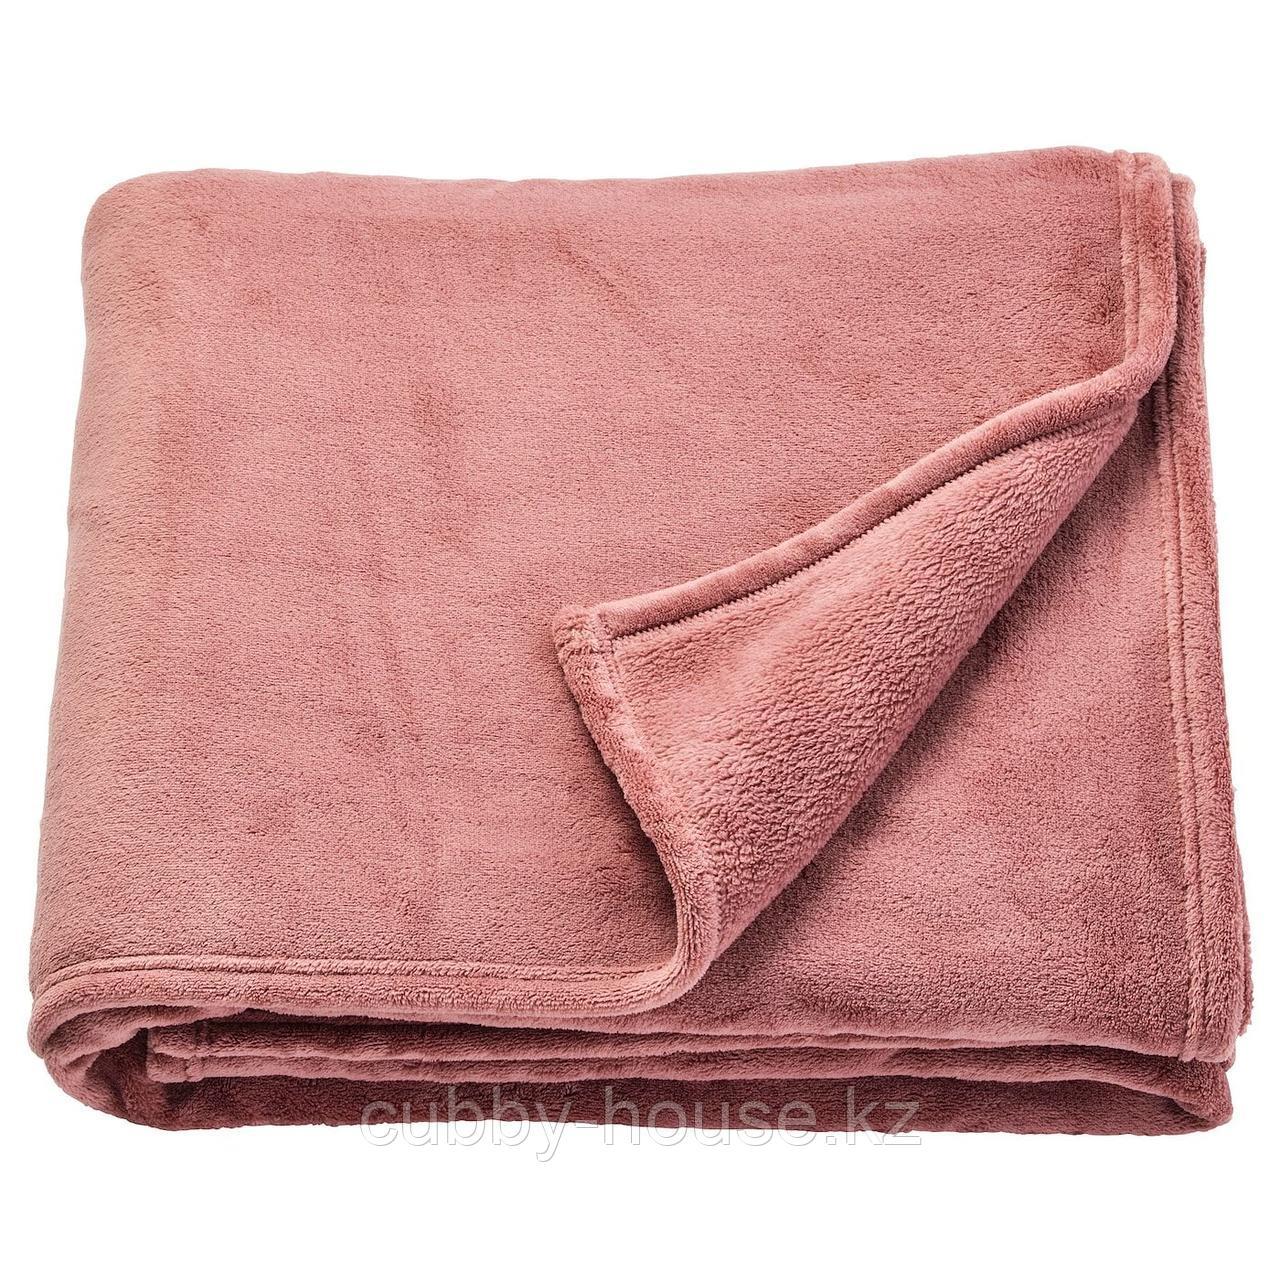 ТРАТТВИВА Покрывало, темно-розовый, 230x250 см